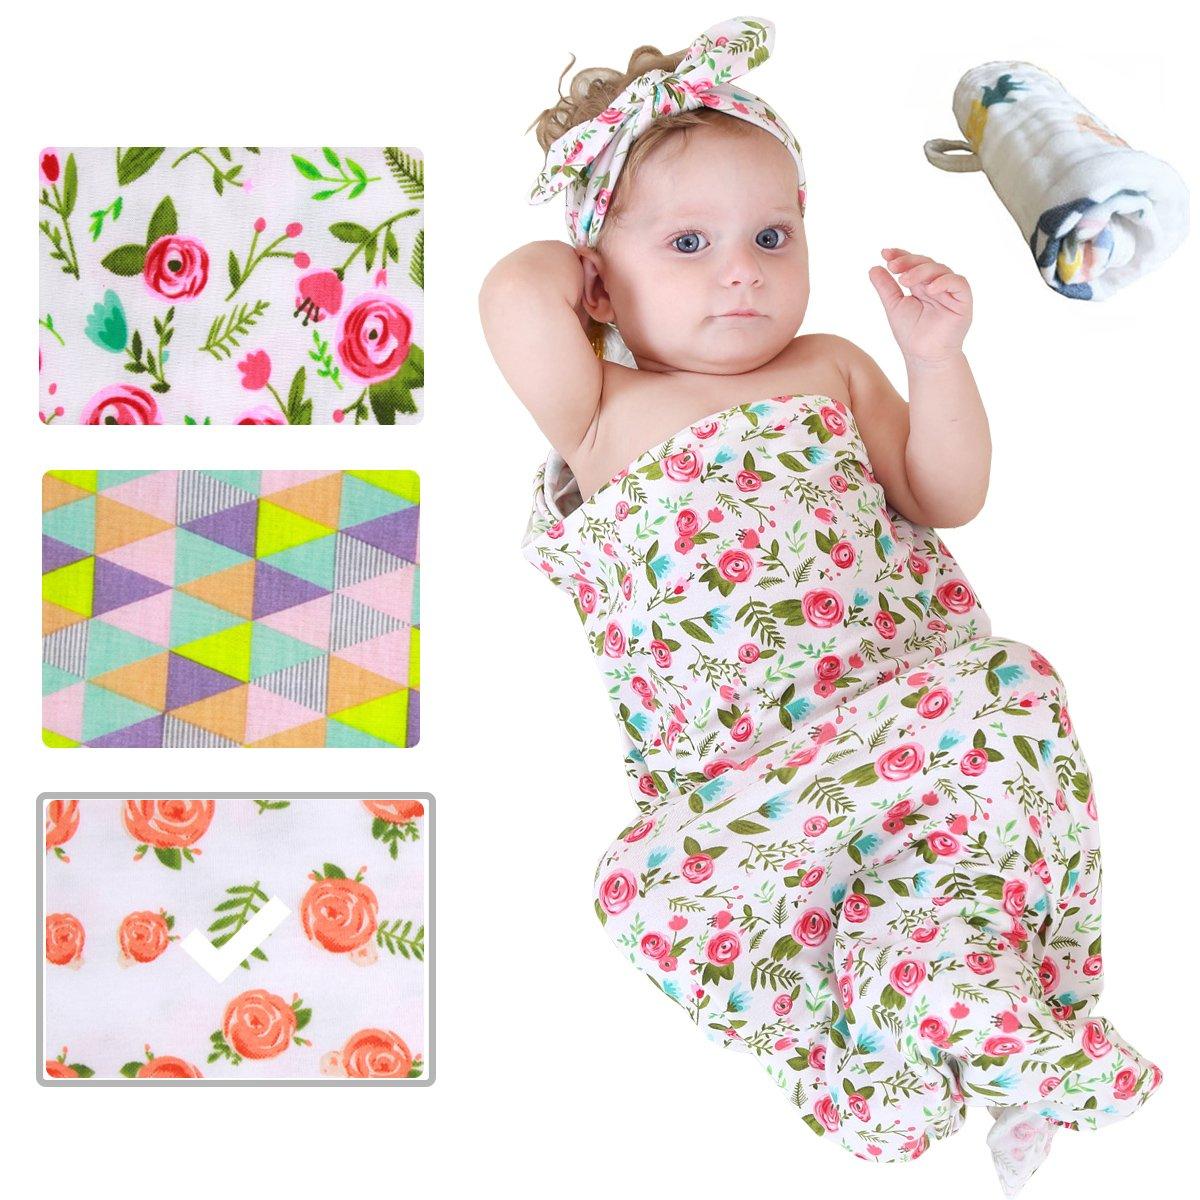 Momloves Newborn Baby Sleep Swaddle Blanket and Headband Value Set,Baby Blankets for Boys & Girls, Newborn Receiving Blanket, Free Baby Towels (Orange Rose)